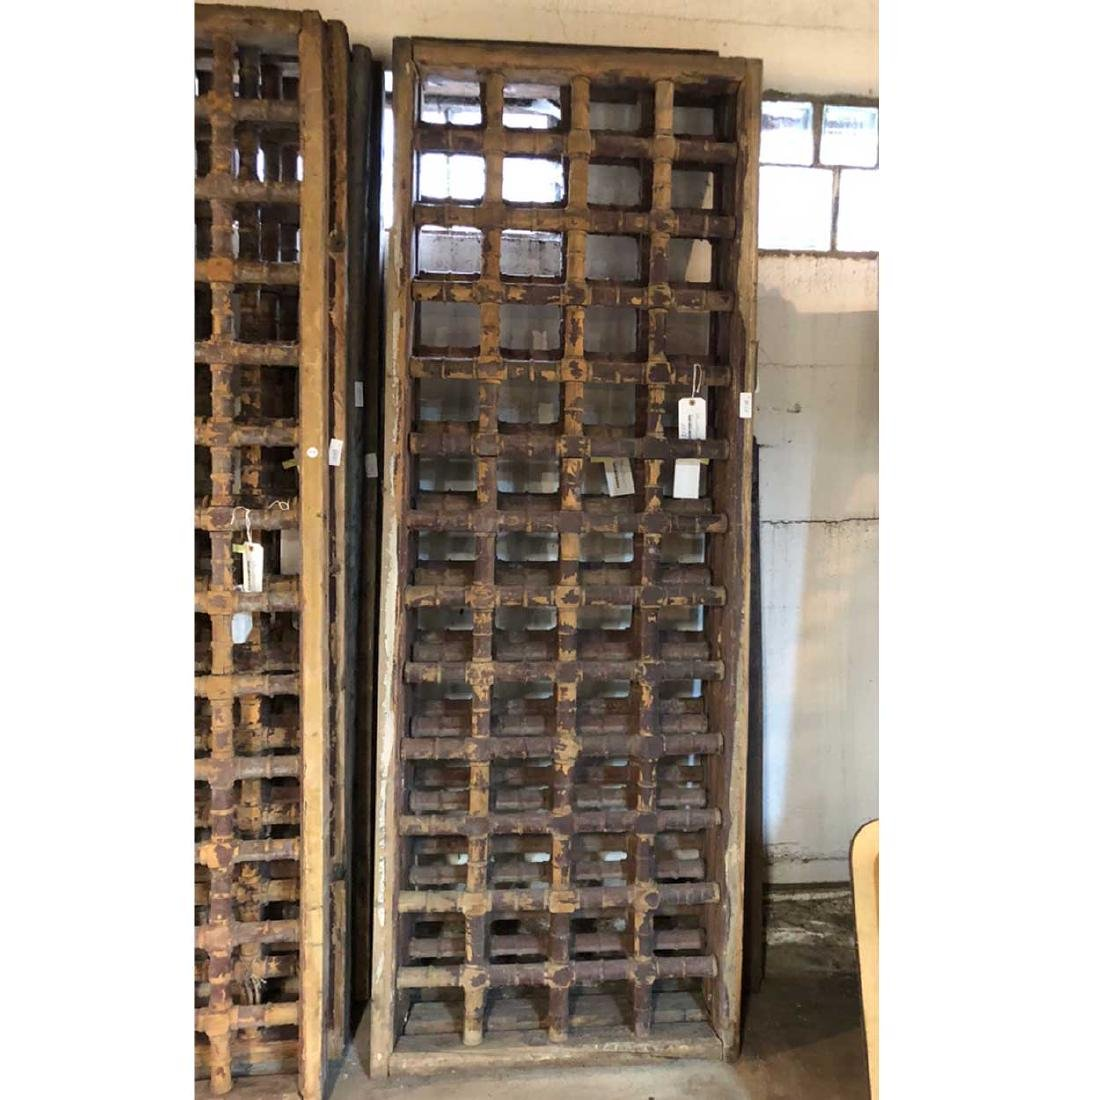 3 Moorish Pine Spindlework Window Grille Panels